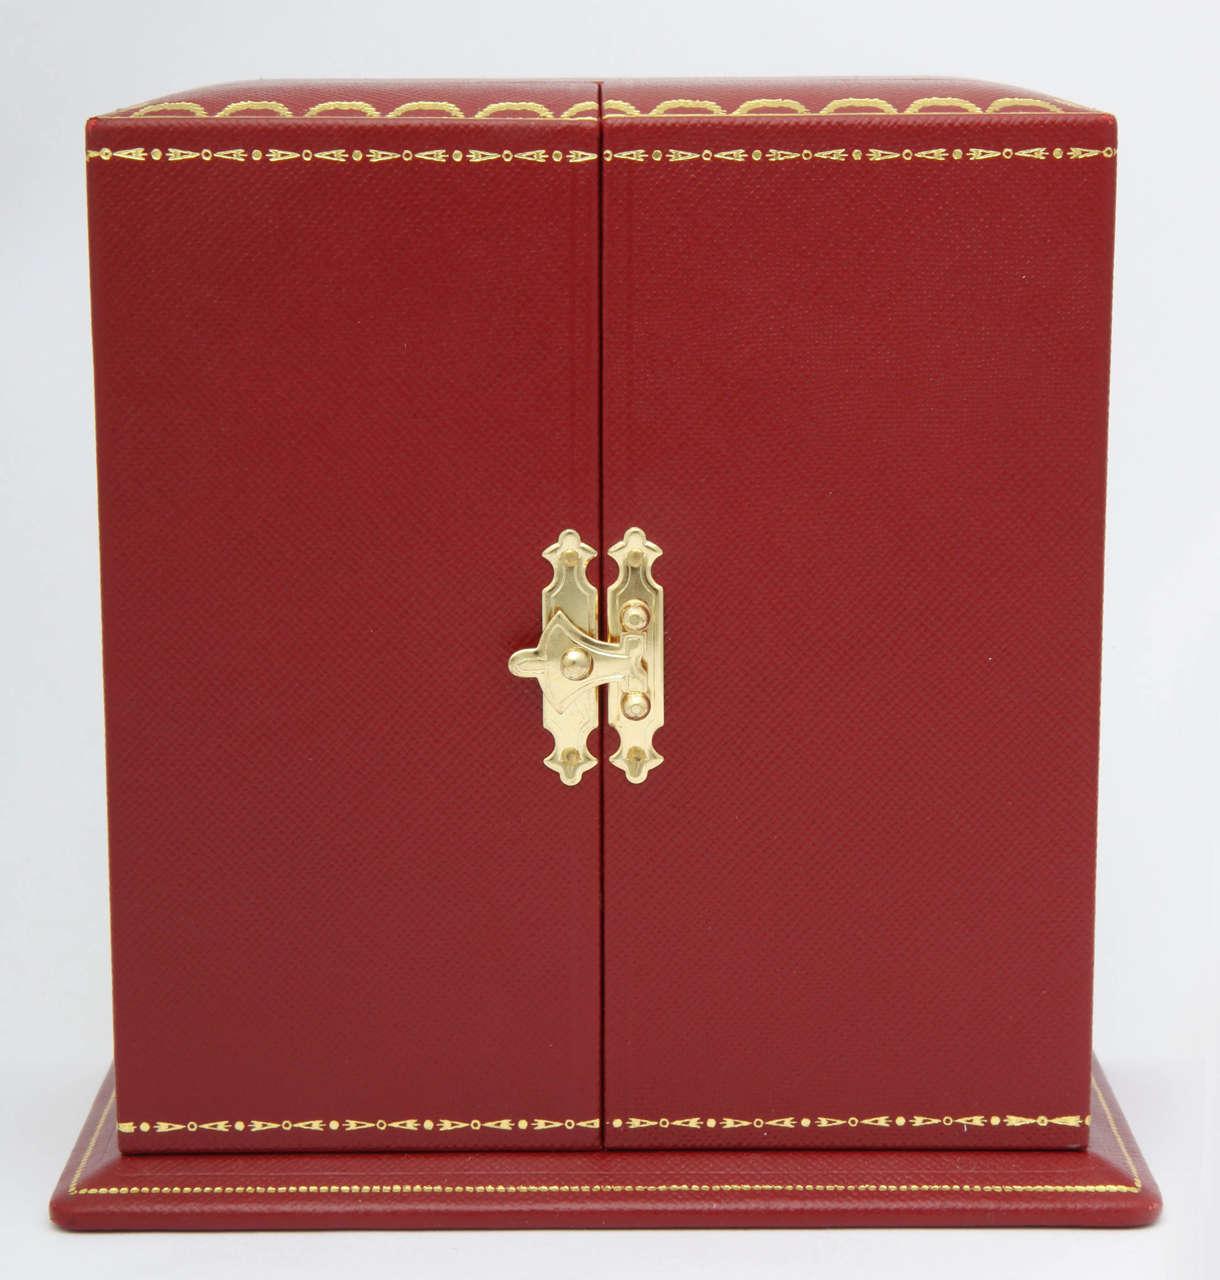 British Cartier Desk Clock and Lighter For Sale